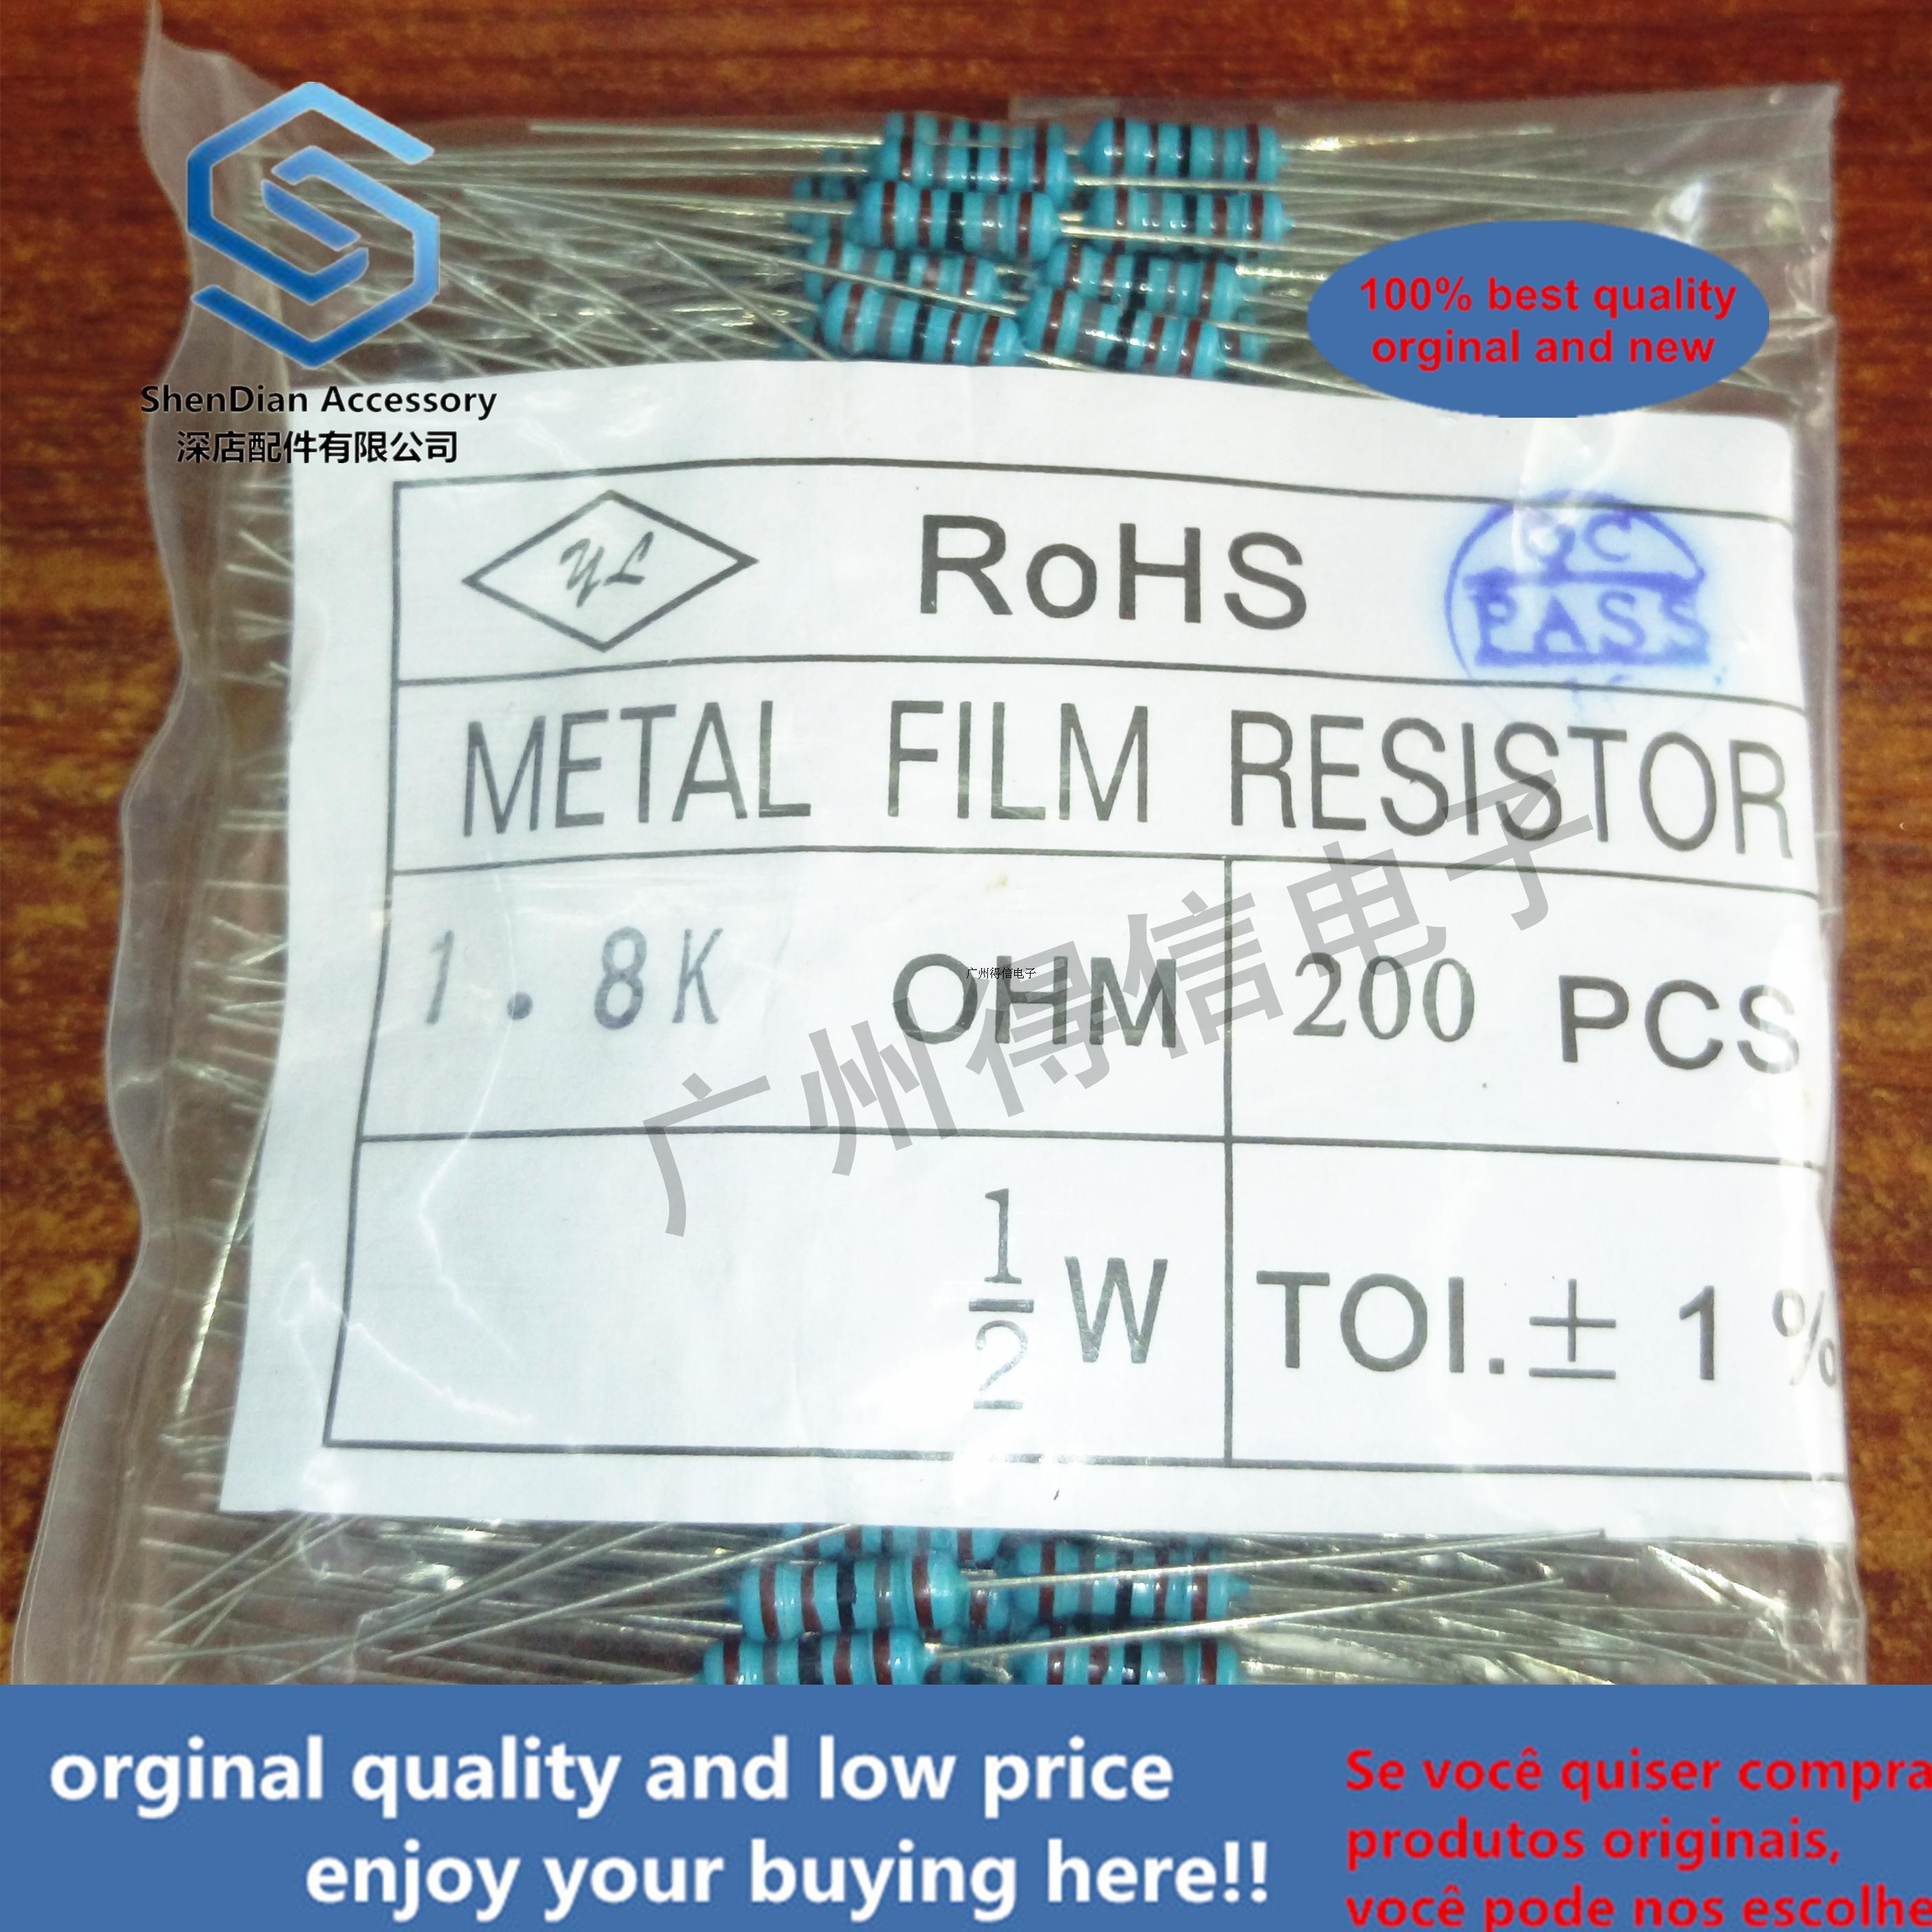 200pcs 1 / 2W 390R 390 Euro 1% Brand New Metal Film Iron Feet Resistor Bag 200 Pcs Per Pack